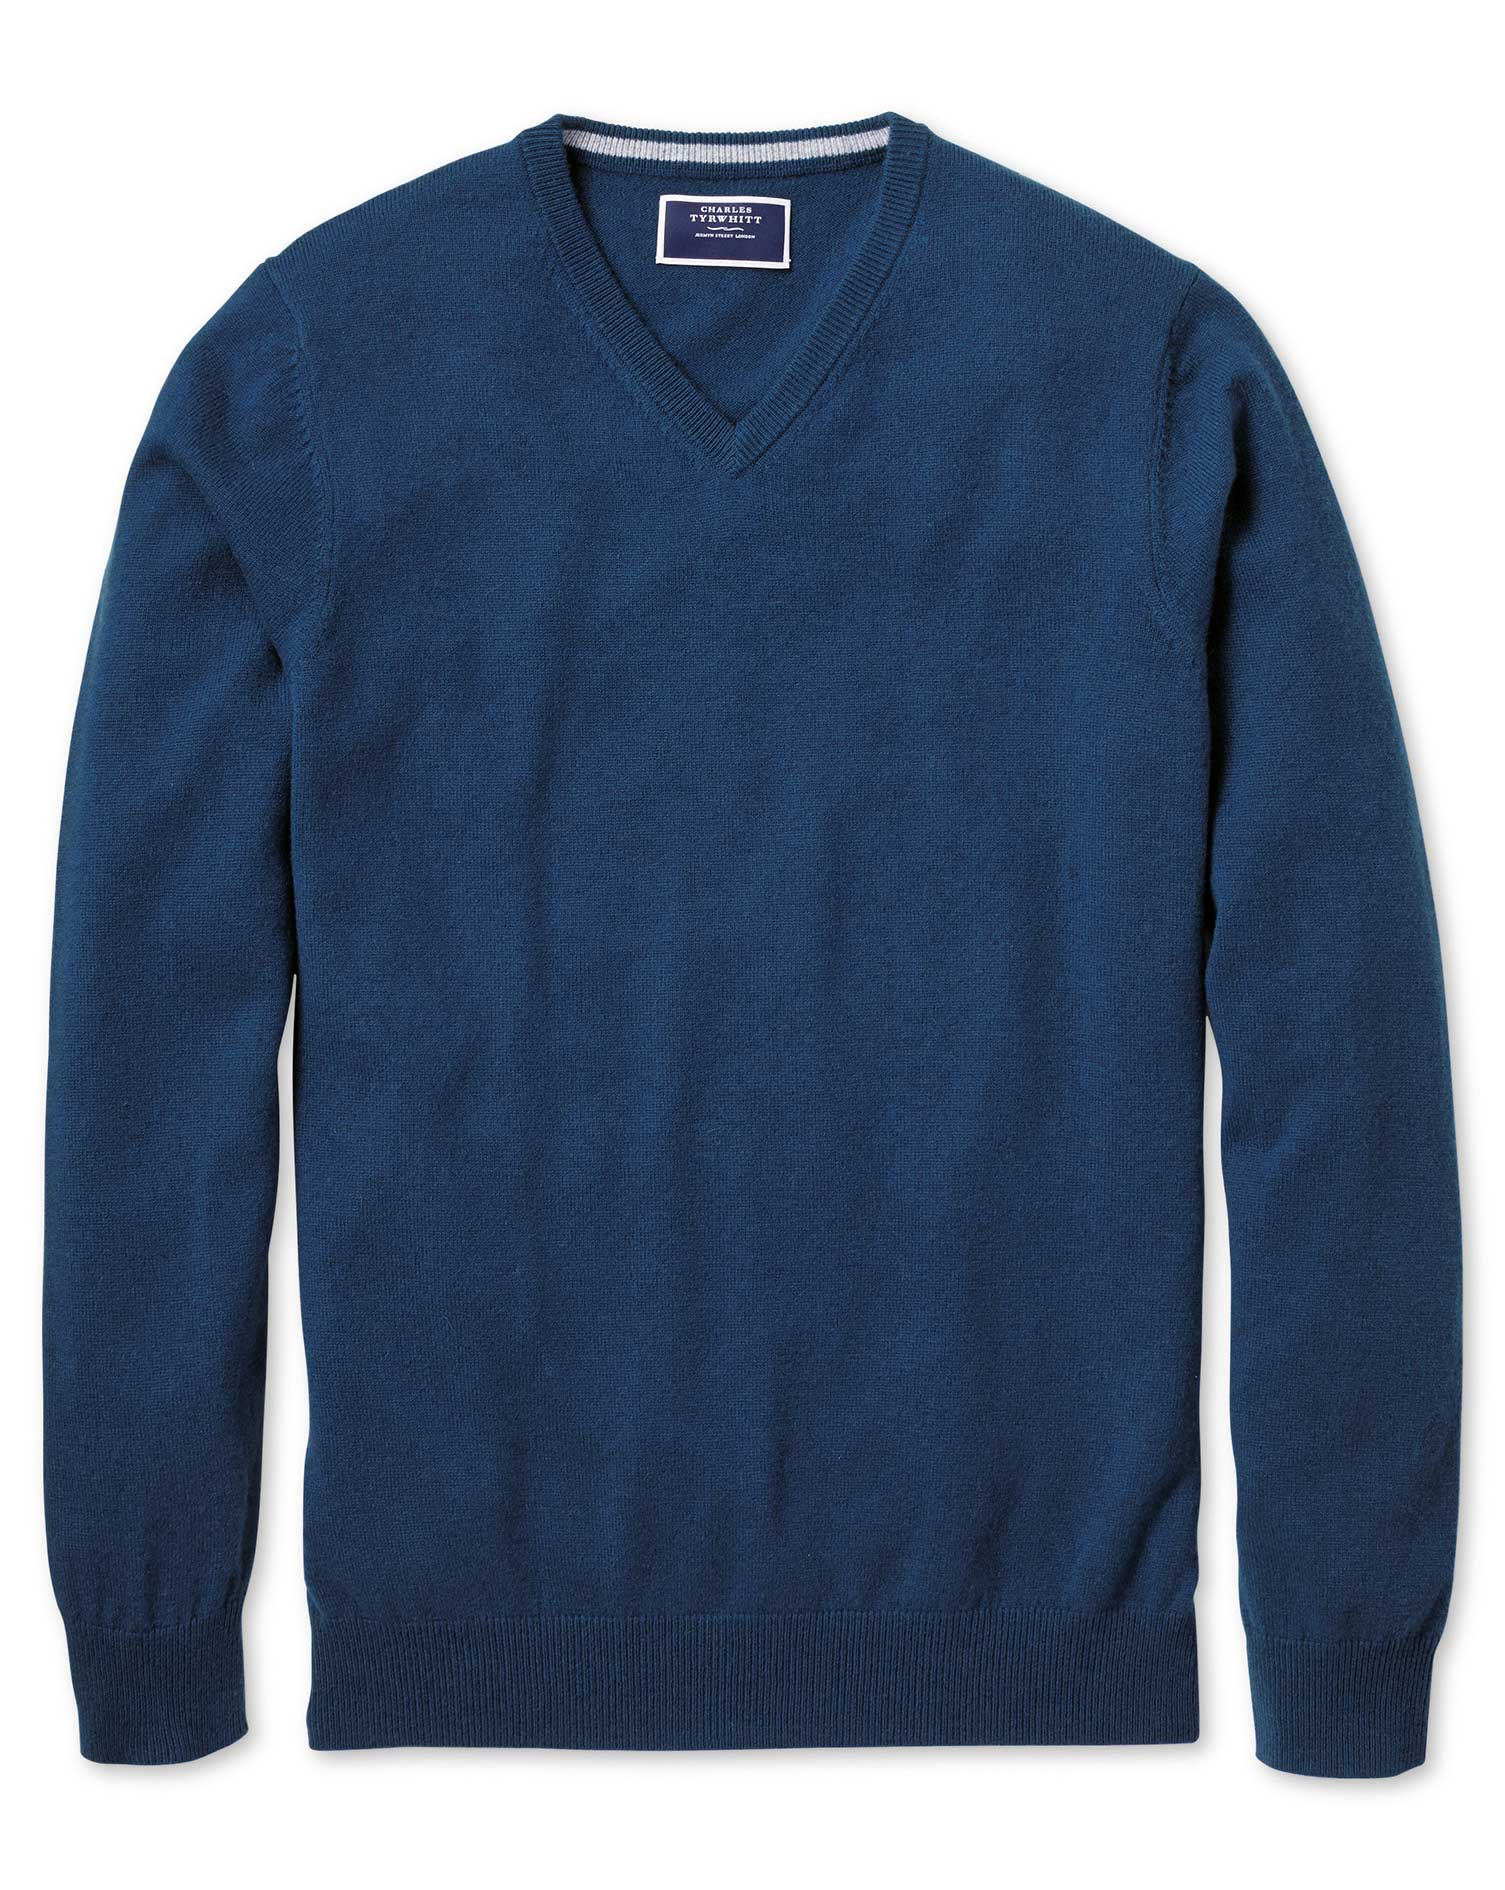 Blue V-Neck Cashmere Jumper Size XS by Charles Tyrwhitt